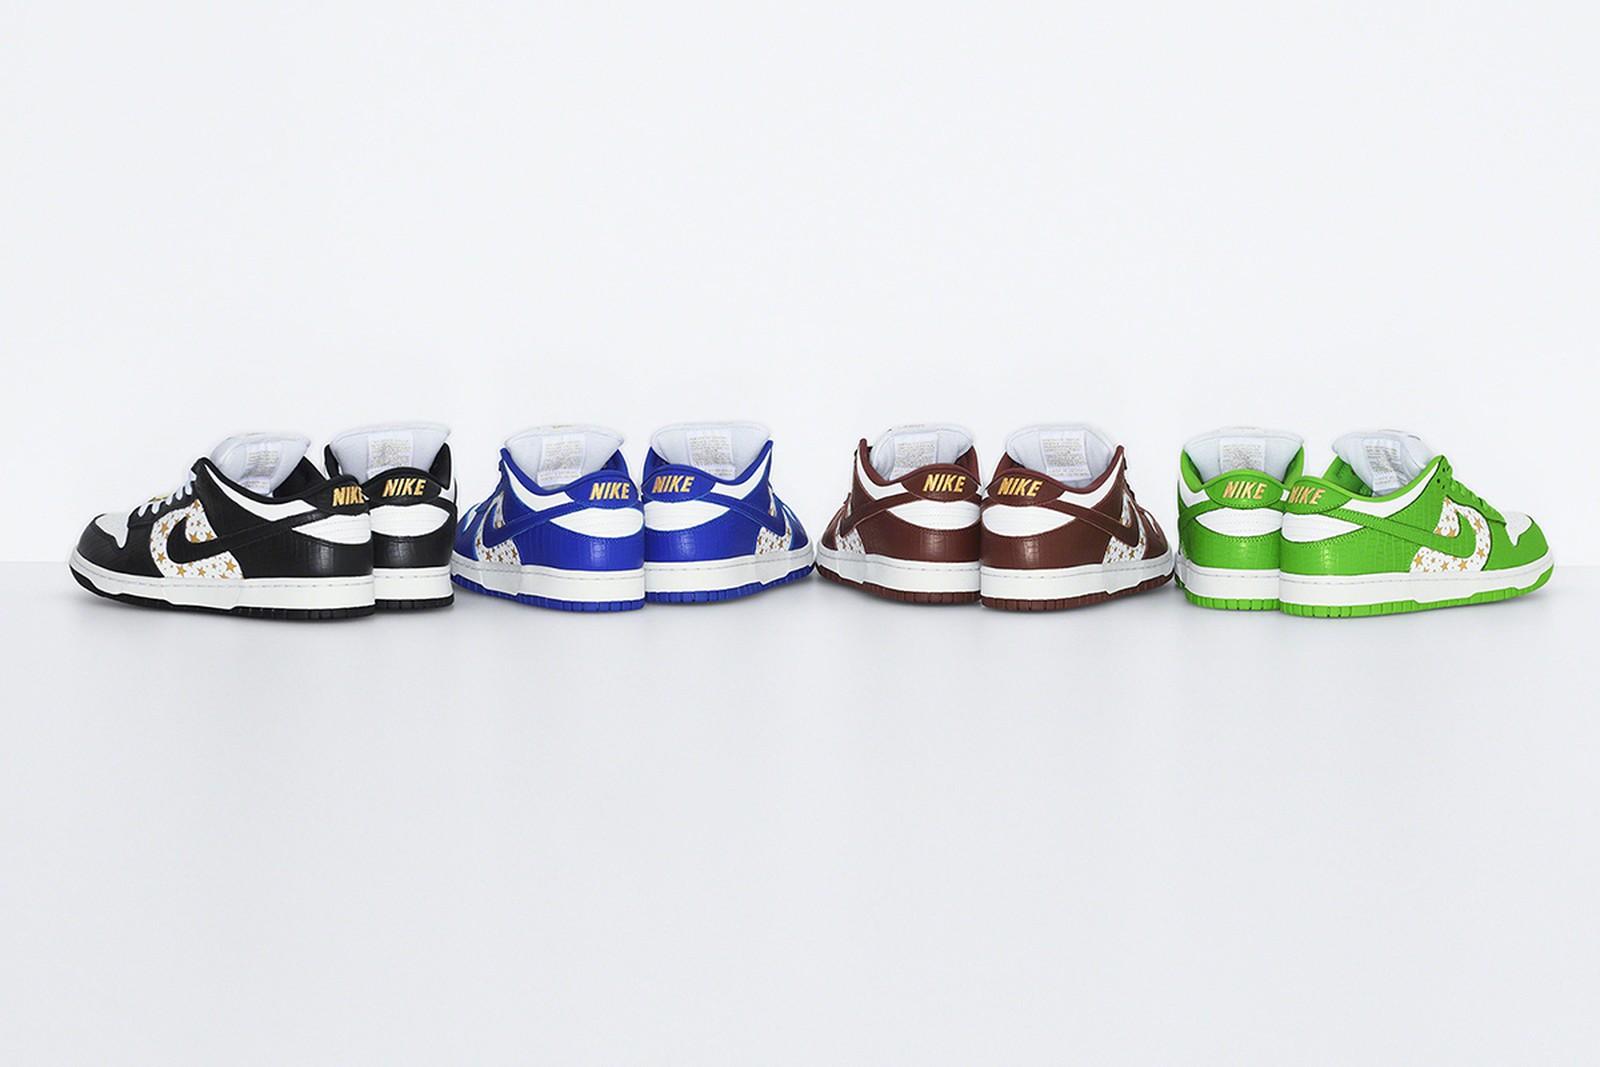 Nike,Supreme,SB Dunk,发售  SNKRS 不发?!Supreme x SB Dunk 本周发售!现在天价了!